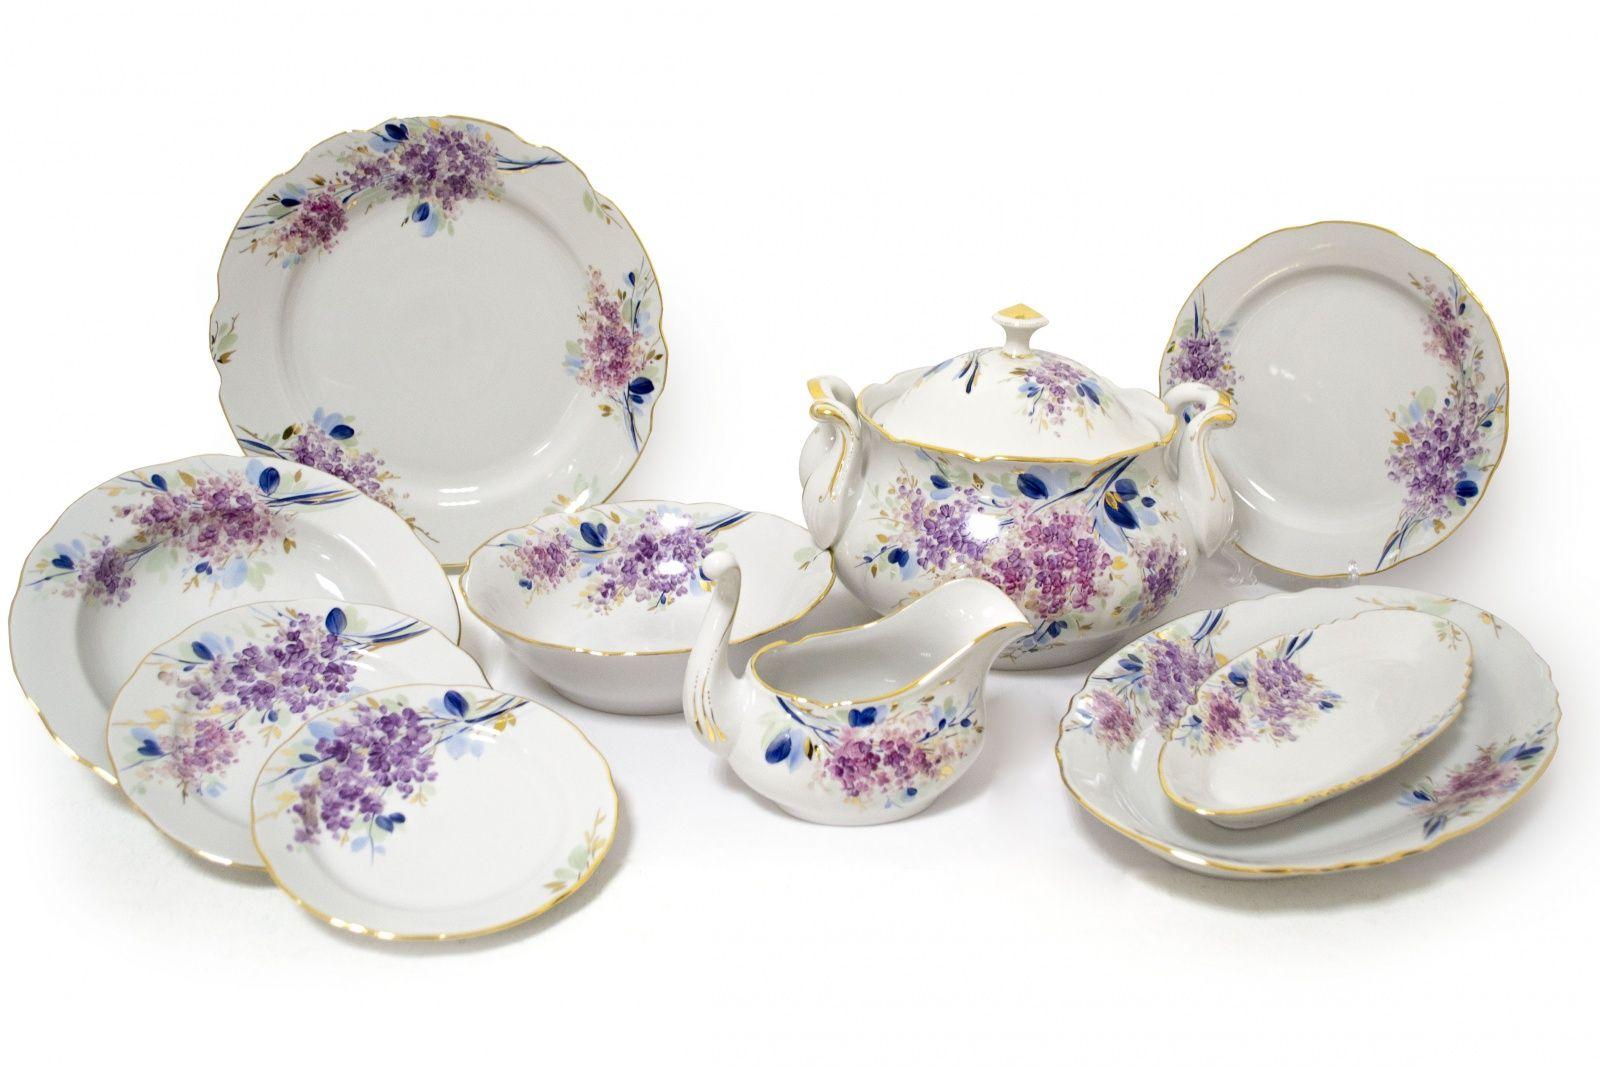 Dulevo porcelain / Table service 34 pcs Appetizing White Night, author Yasnetsova M.V.